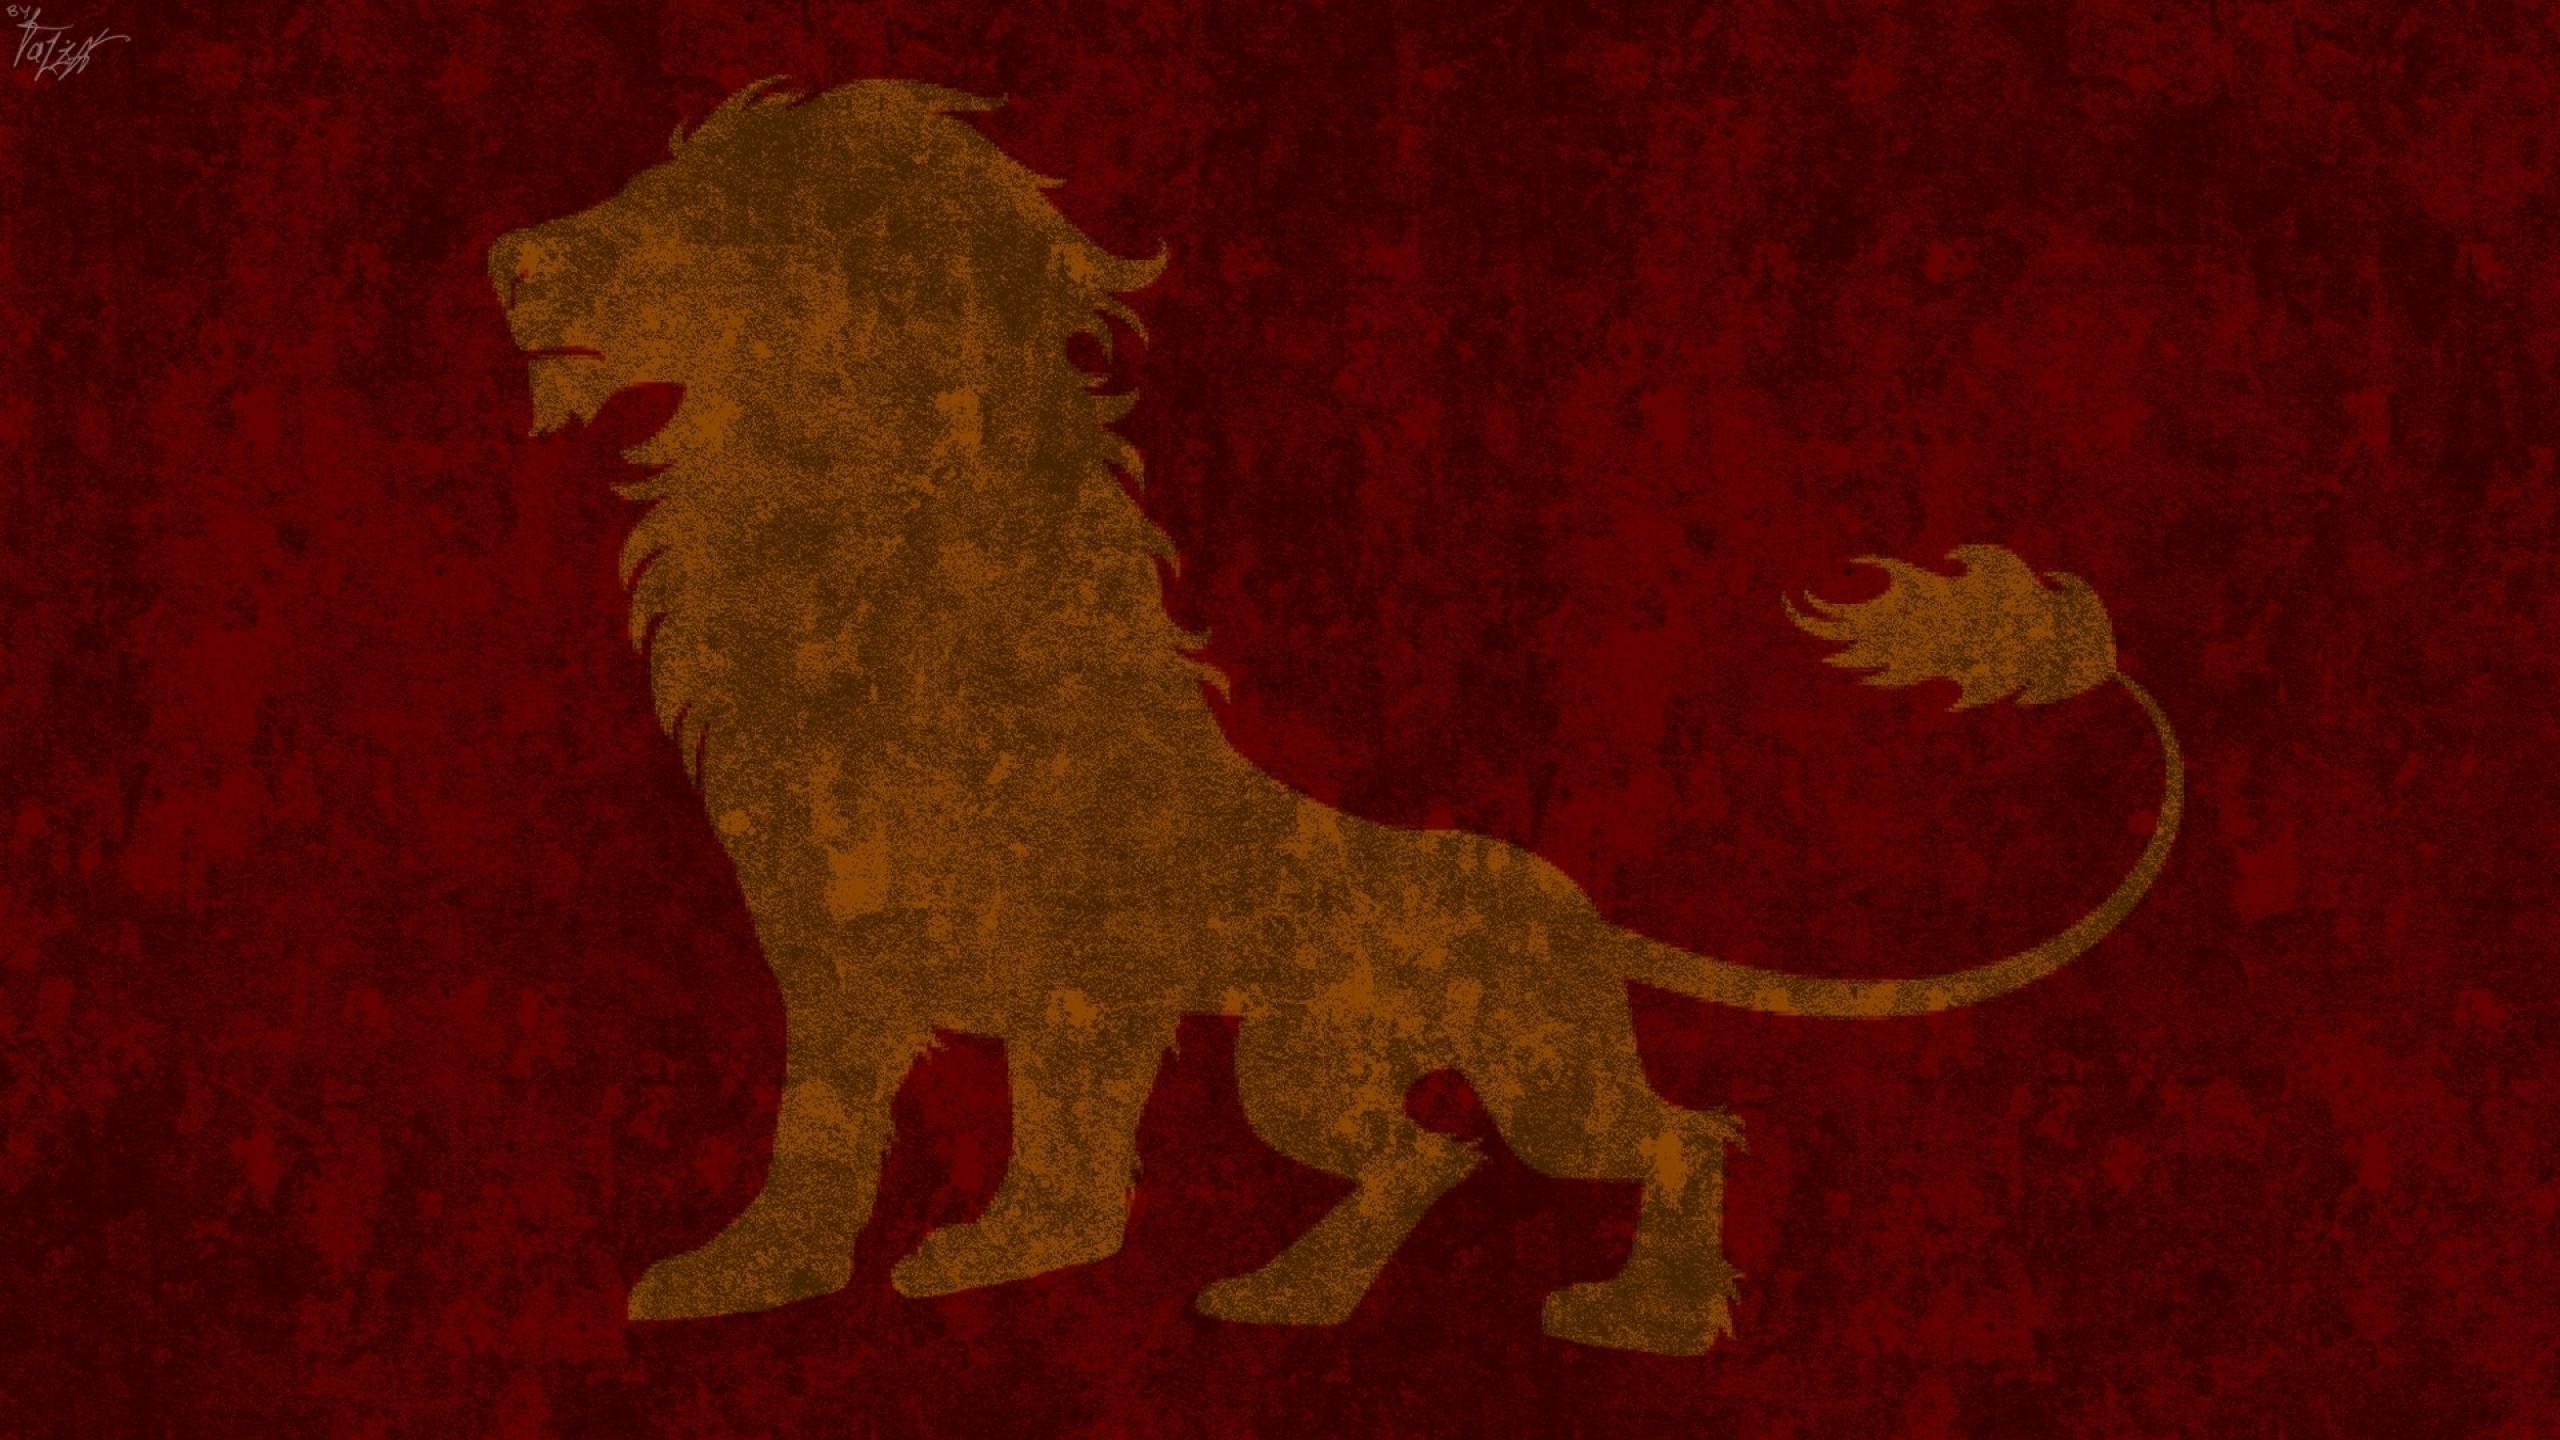 movies harry potter emblems logos gryffindor 1920×1080 wallpaper Art HD  Wallpaper